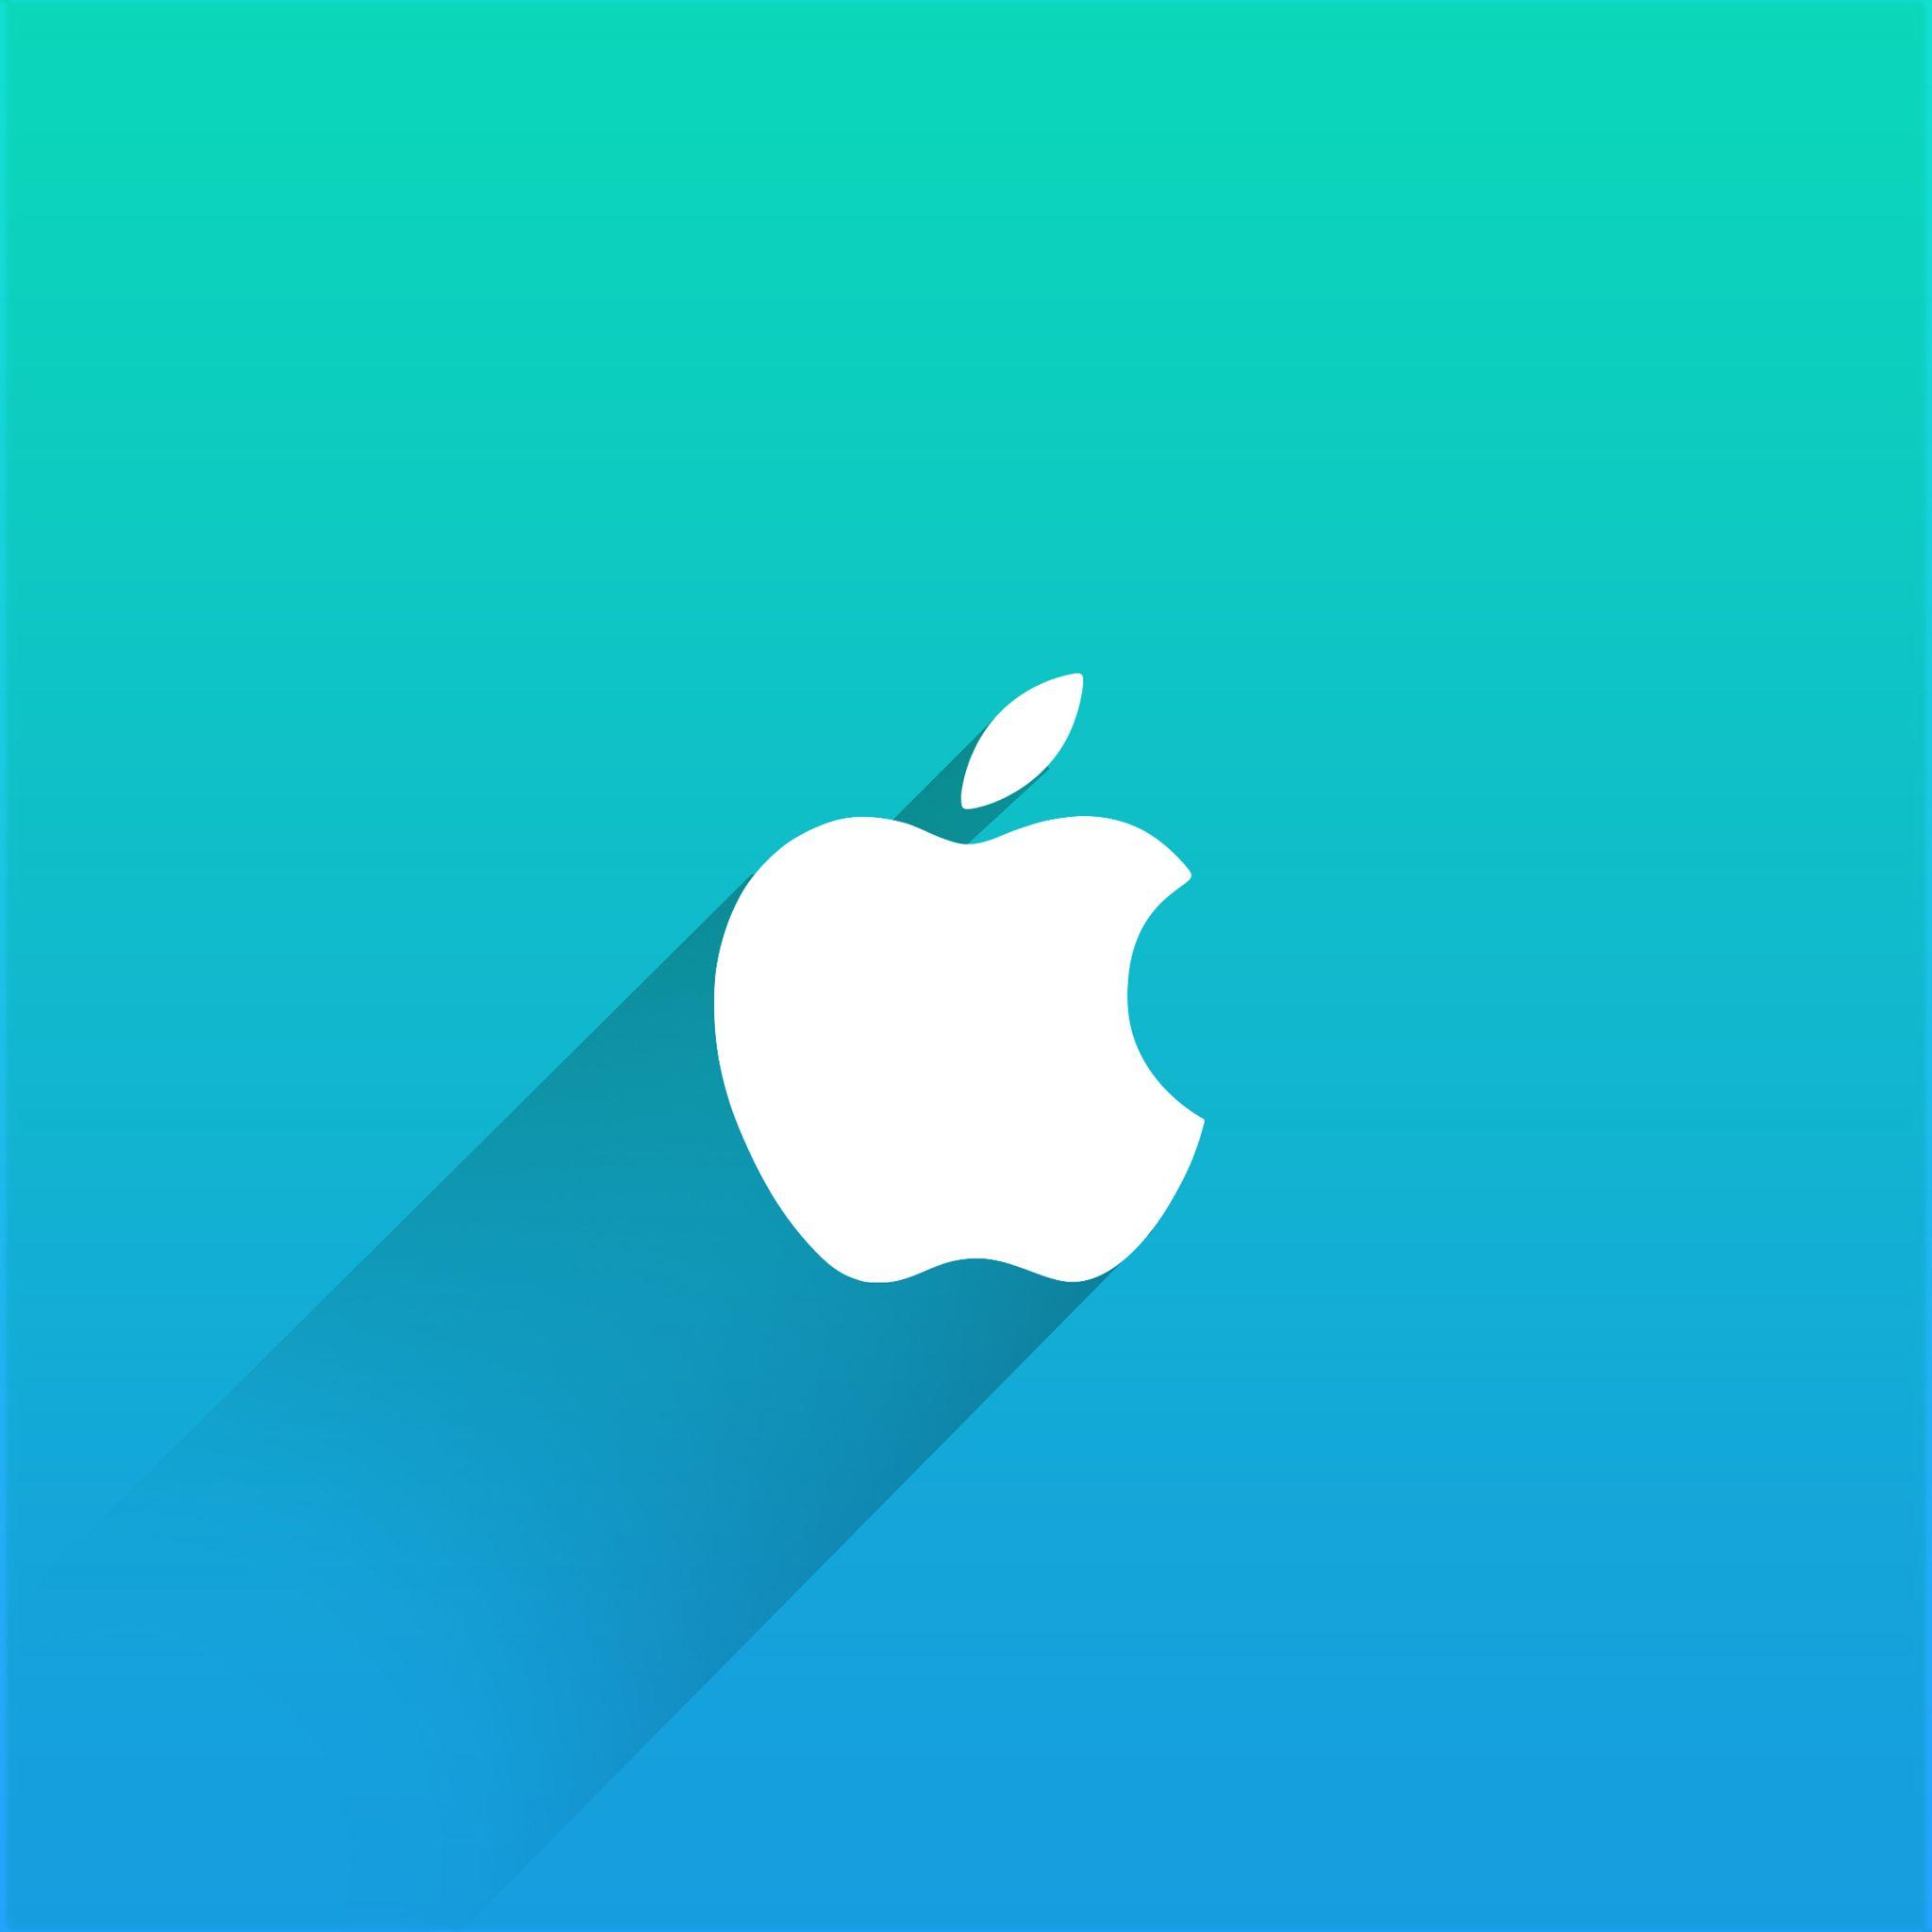 FLAT DESIGN WALLPAPER Ipad Wallpaper Retina Apple Logo Wallpapers Blue